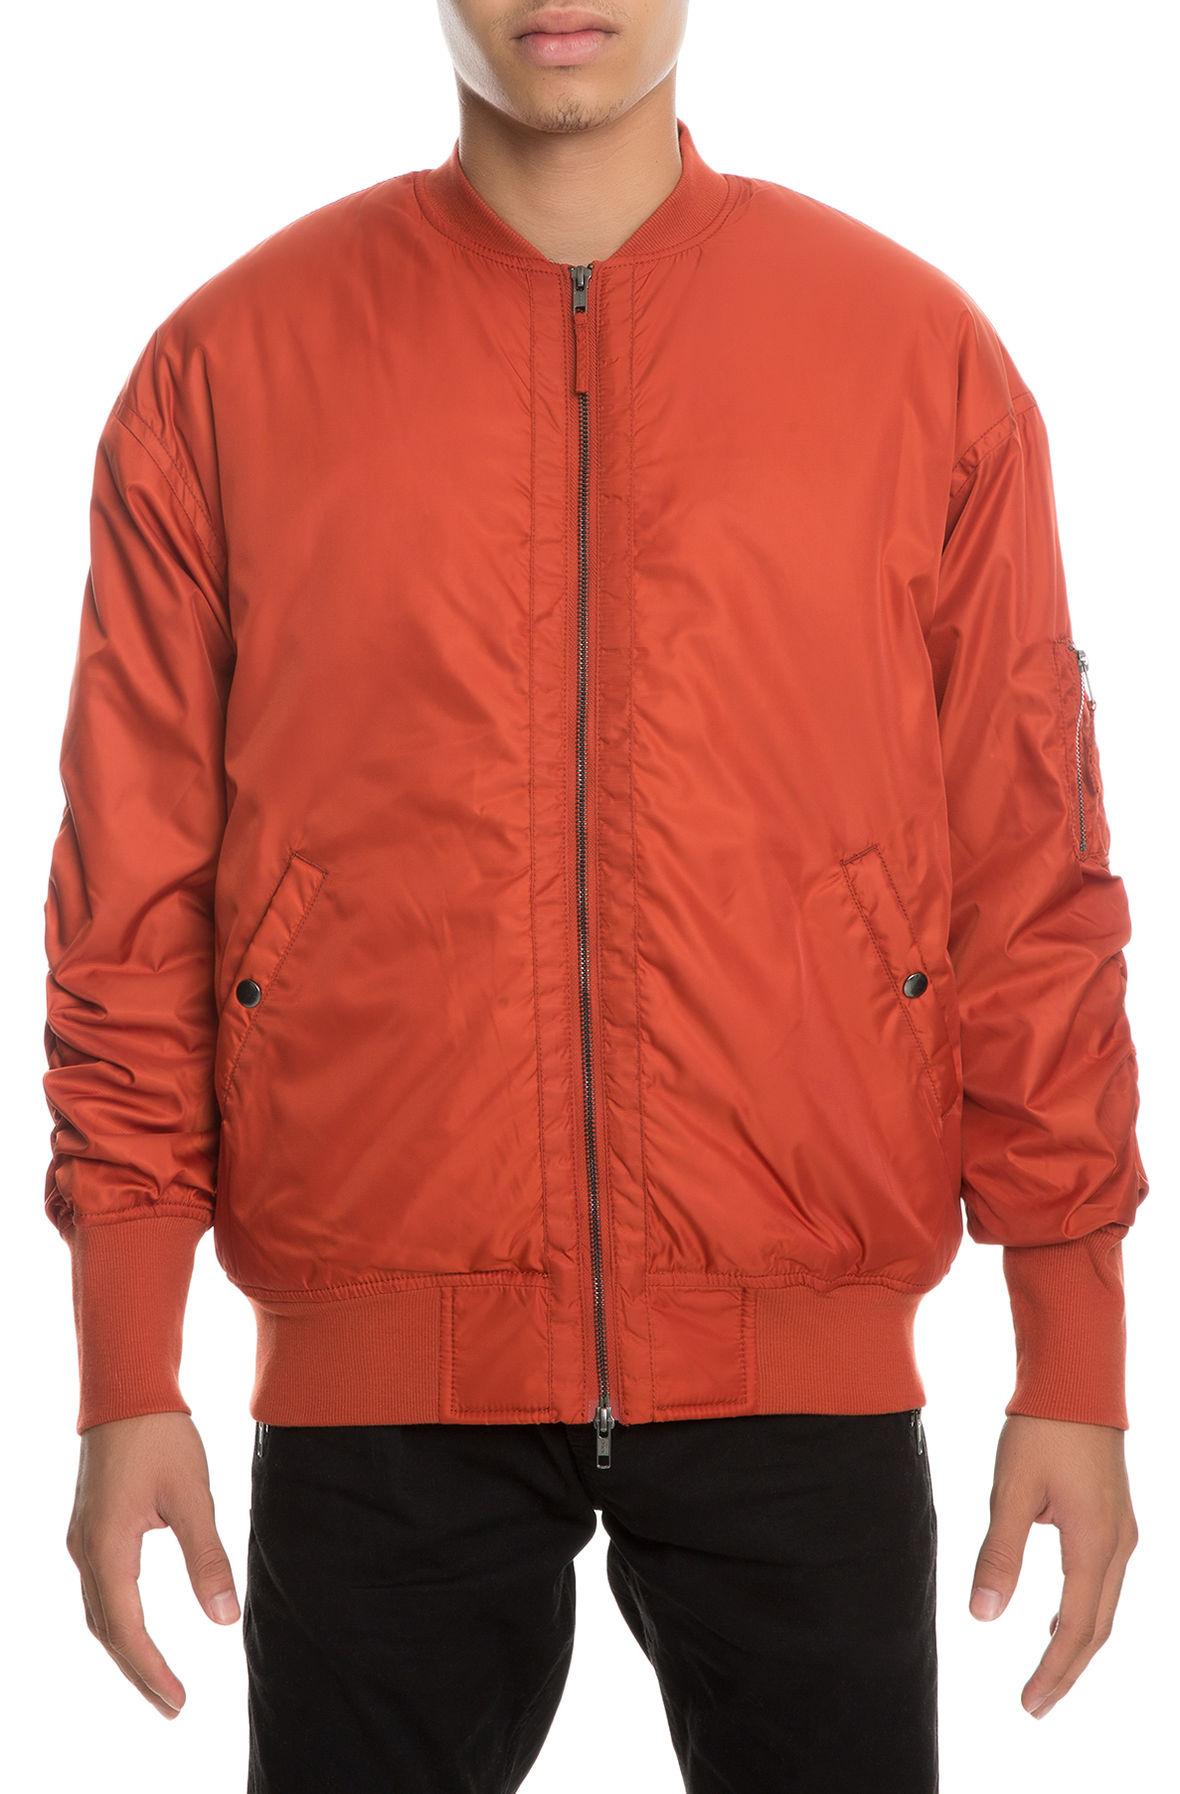 Image of The Drexel Jacket in Orange